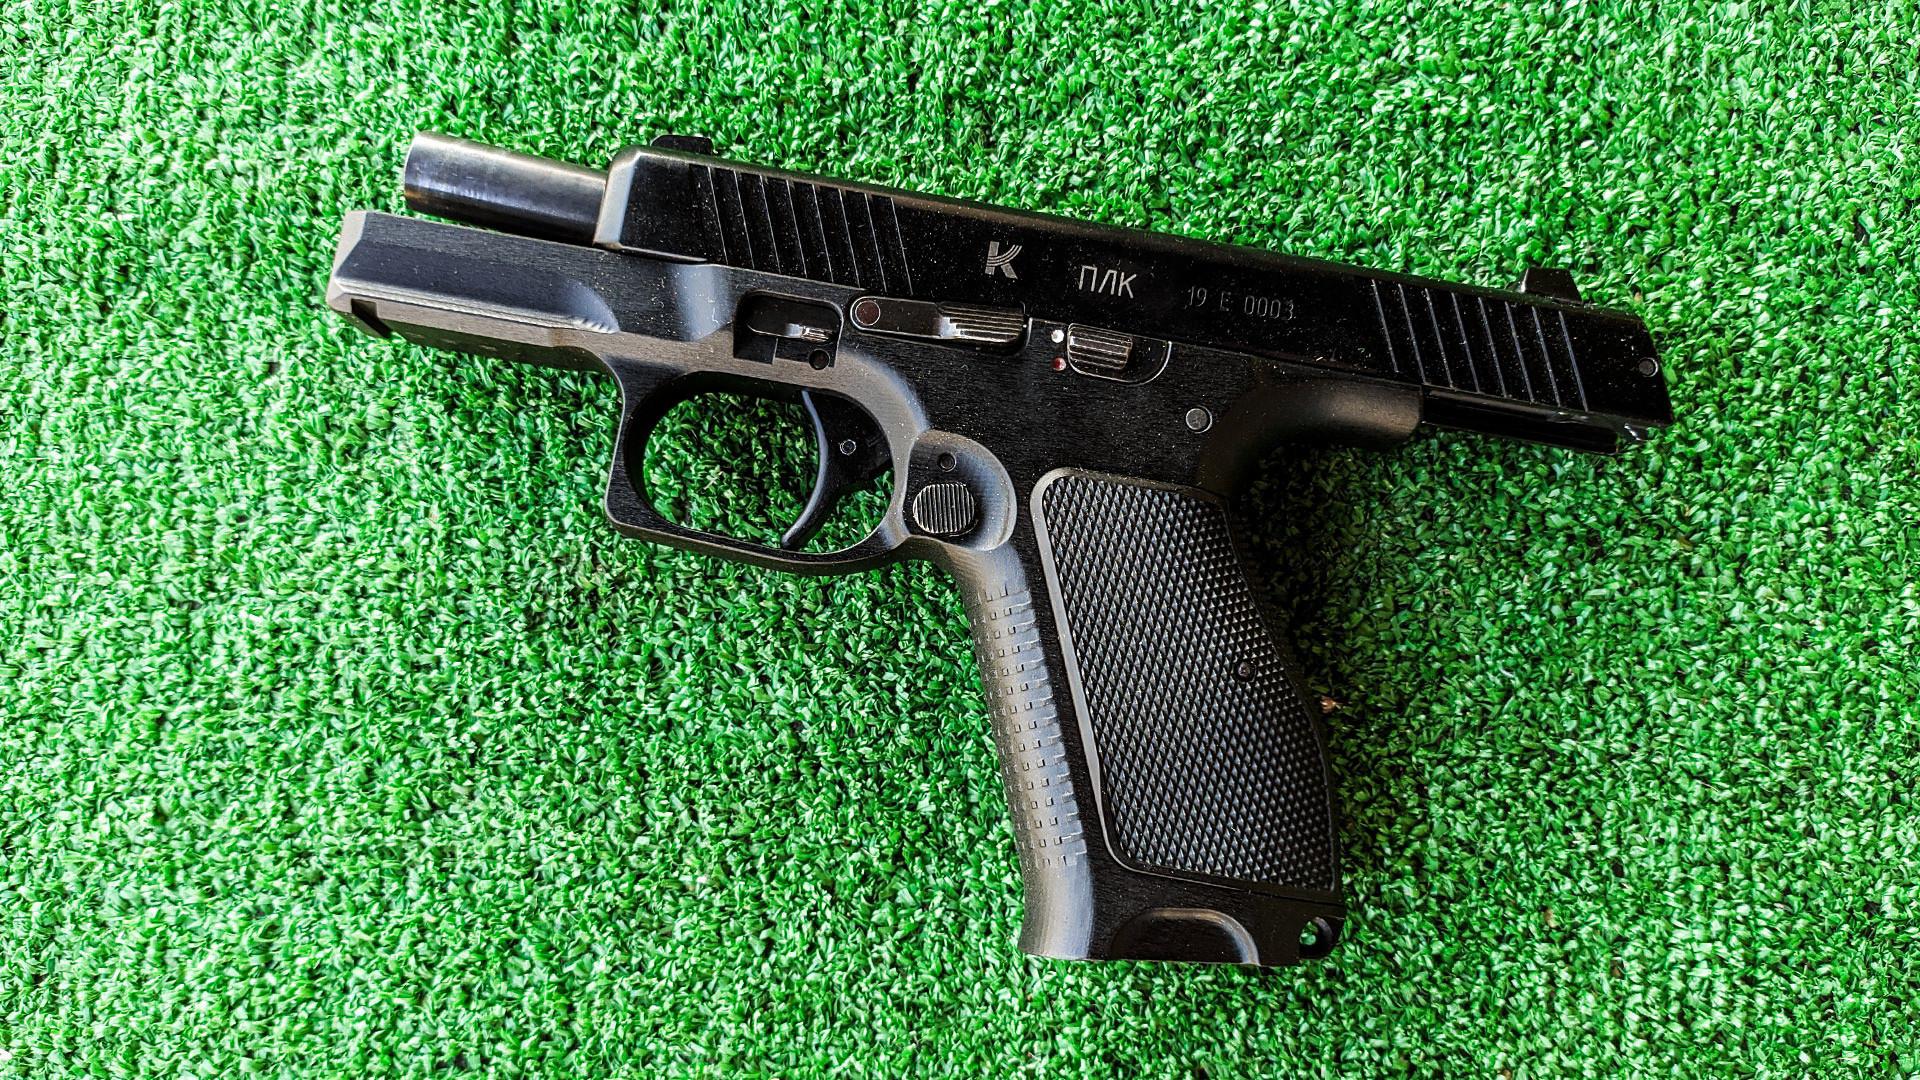 Pištolj PLK